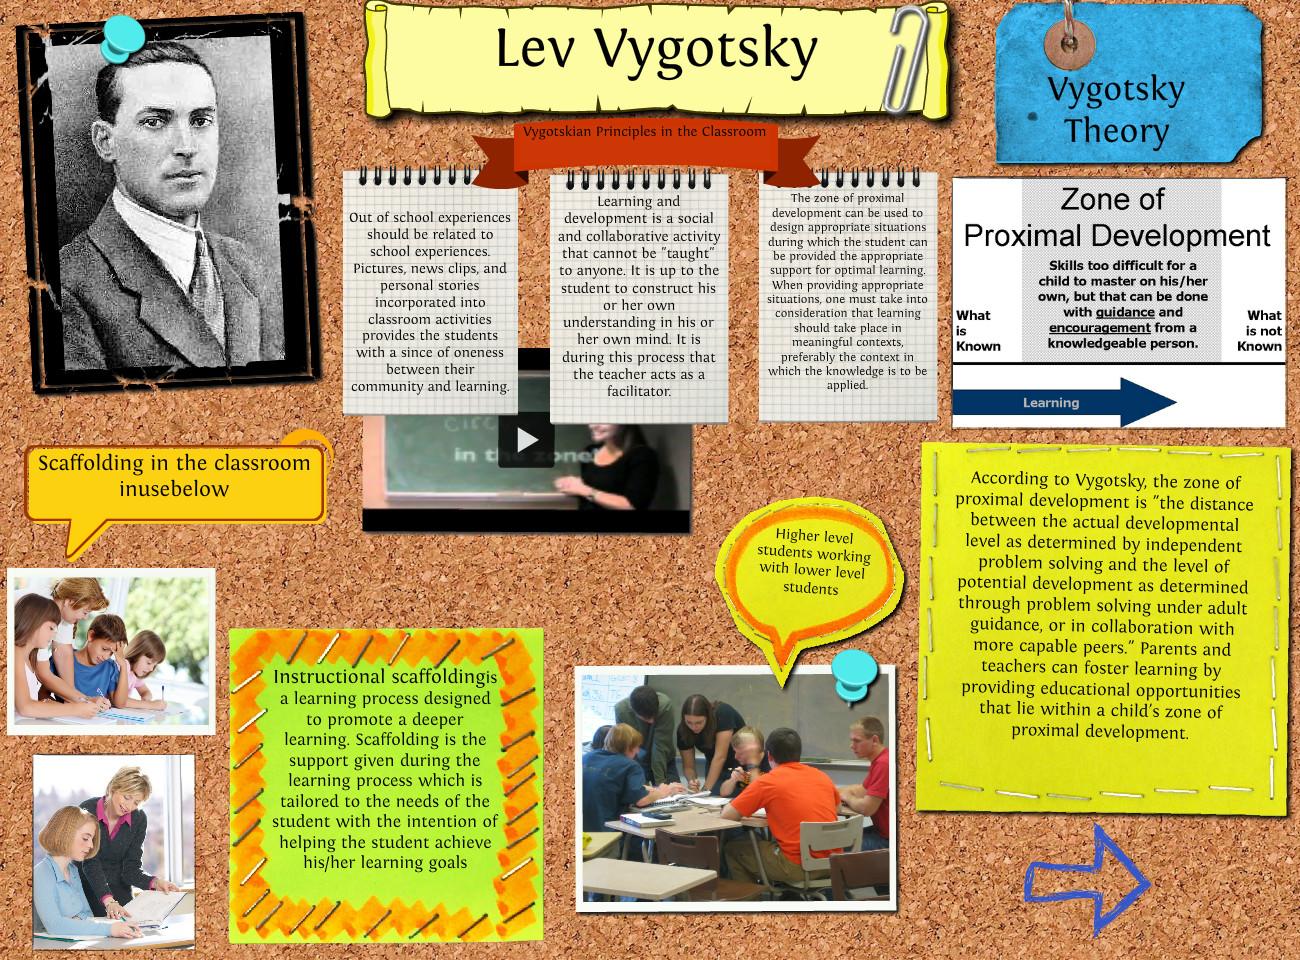 VYGOTSKY, LEV SEMYONOVICH